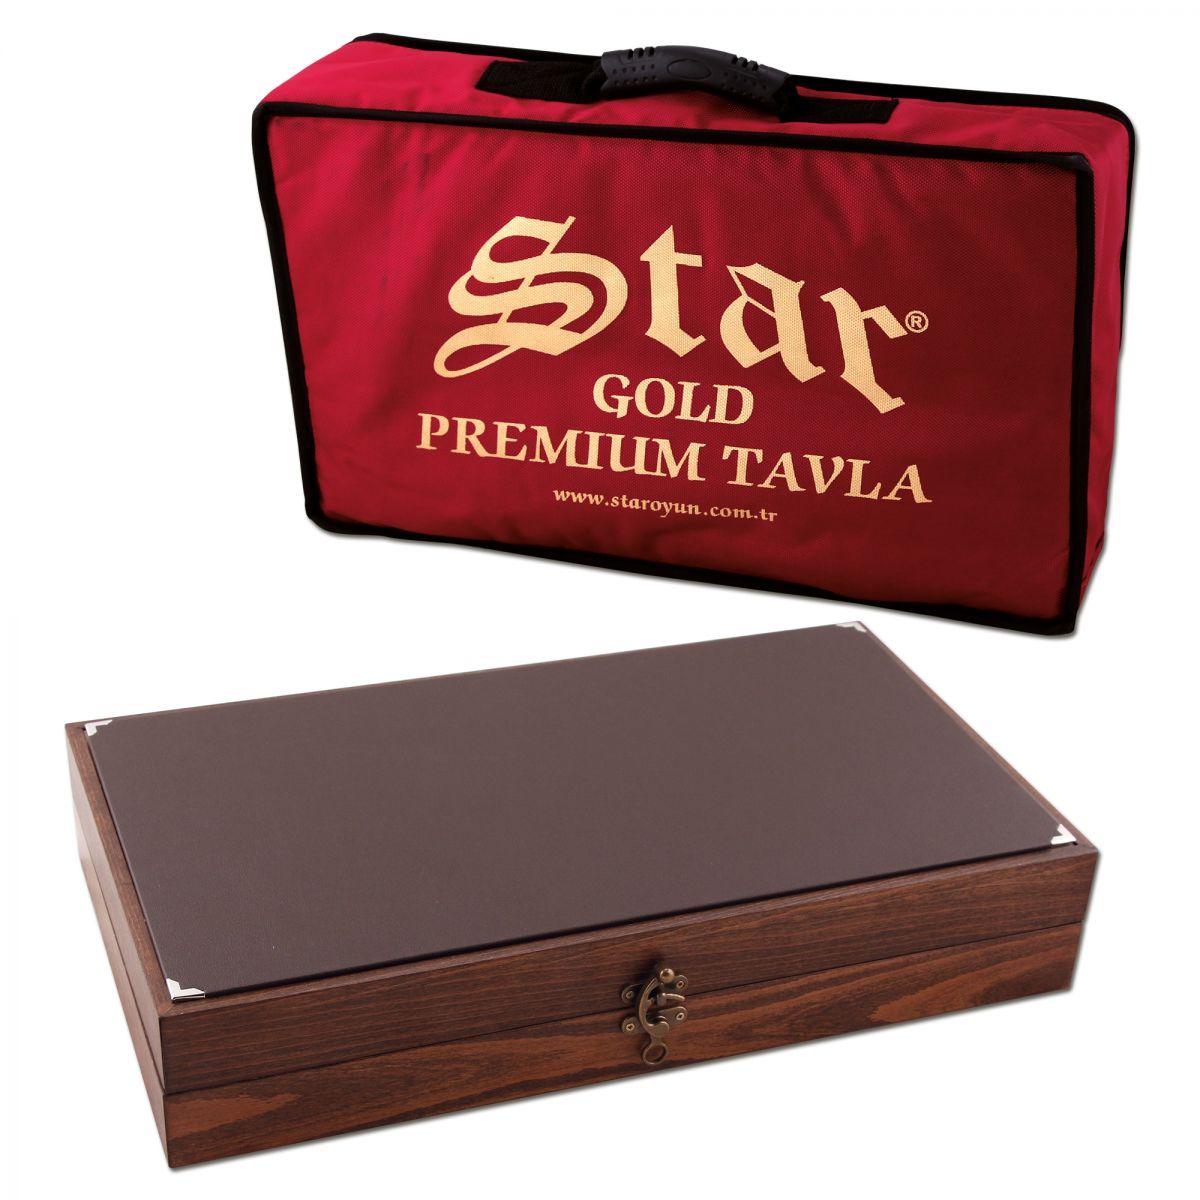 Premium Gold Tavla